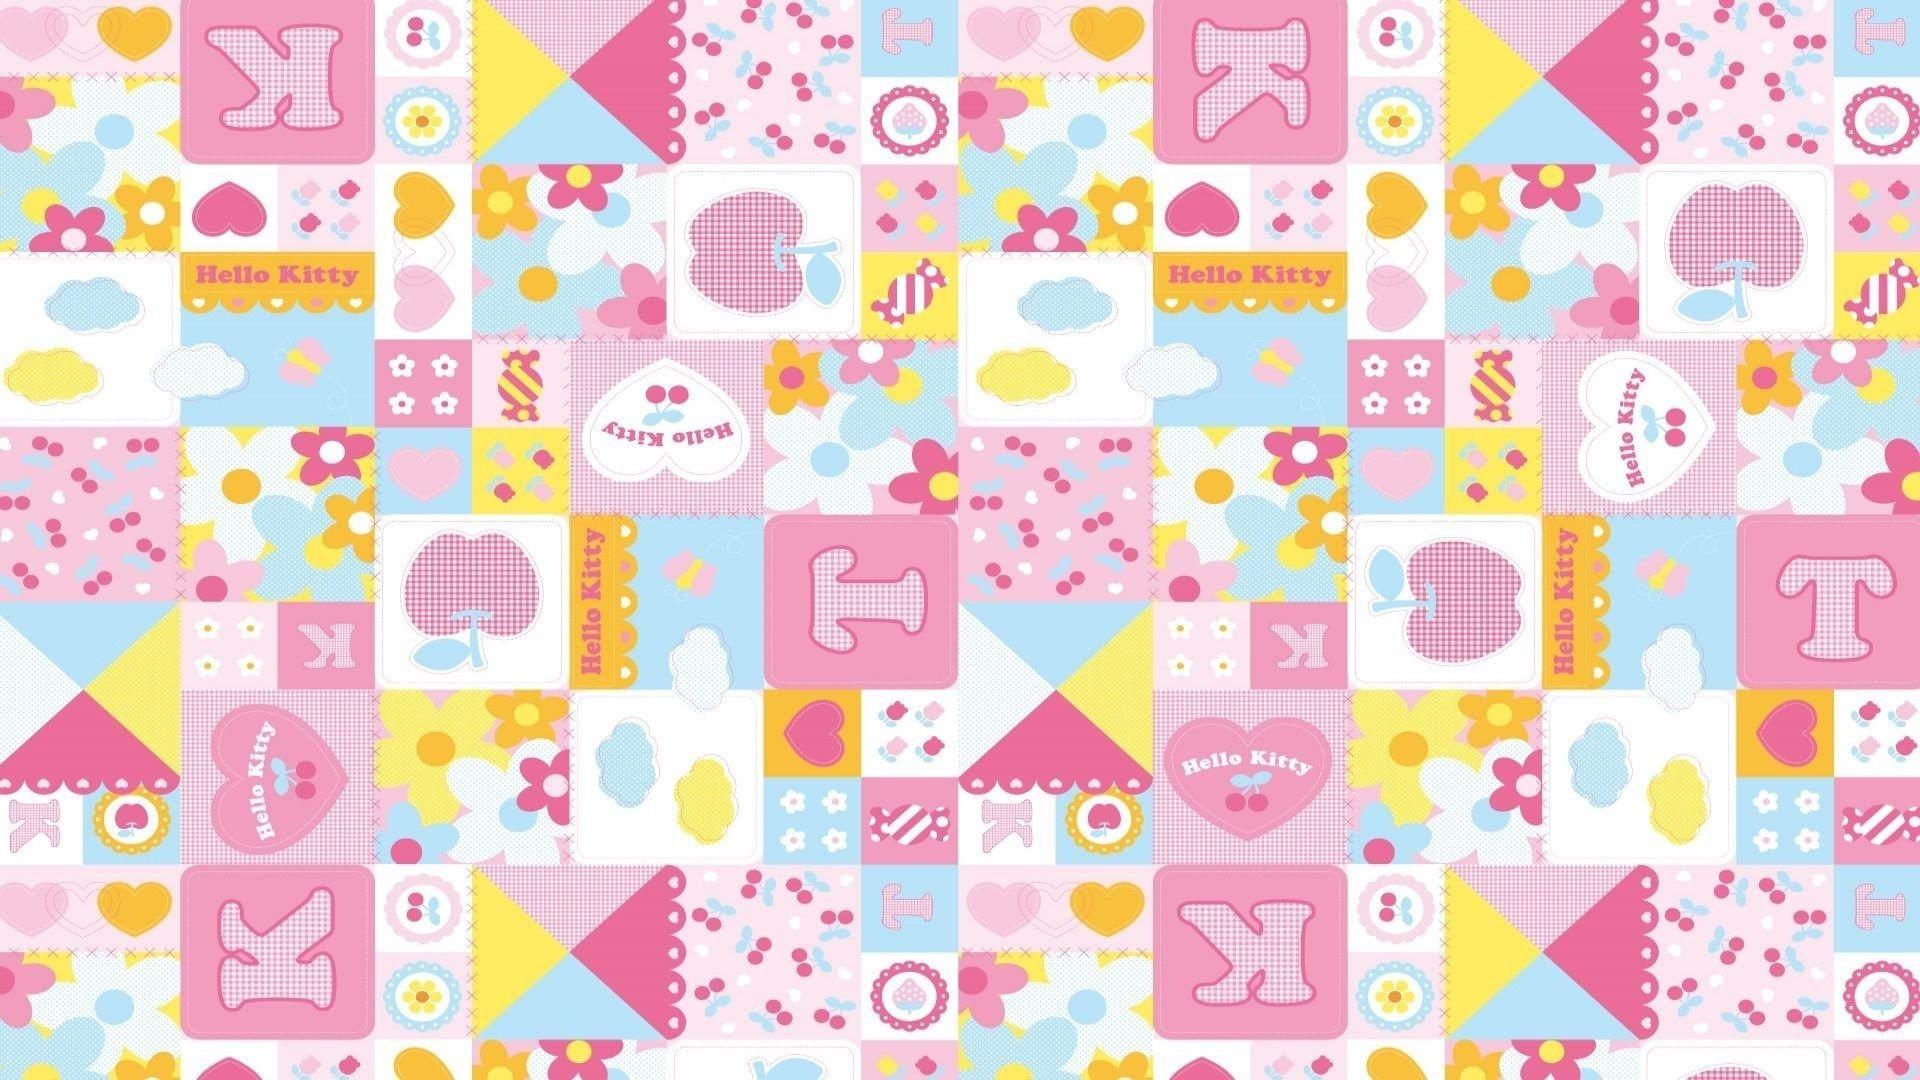 Fantastic Wallpaper Hello Kitty Laptop - 3bf2142826e2b8df7f31f8717fe6f364  Picture_806913.jpg